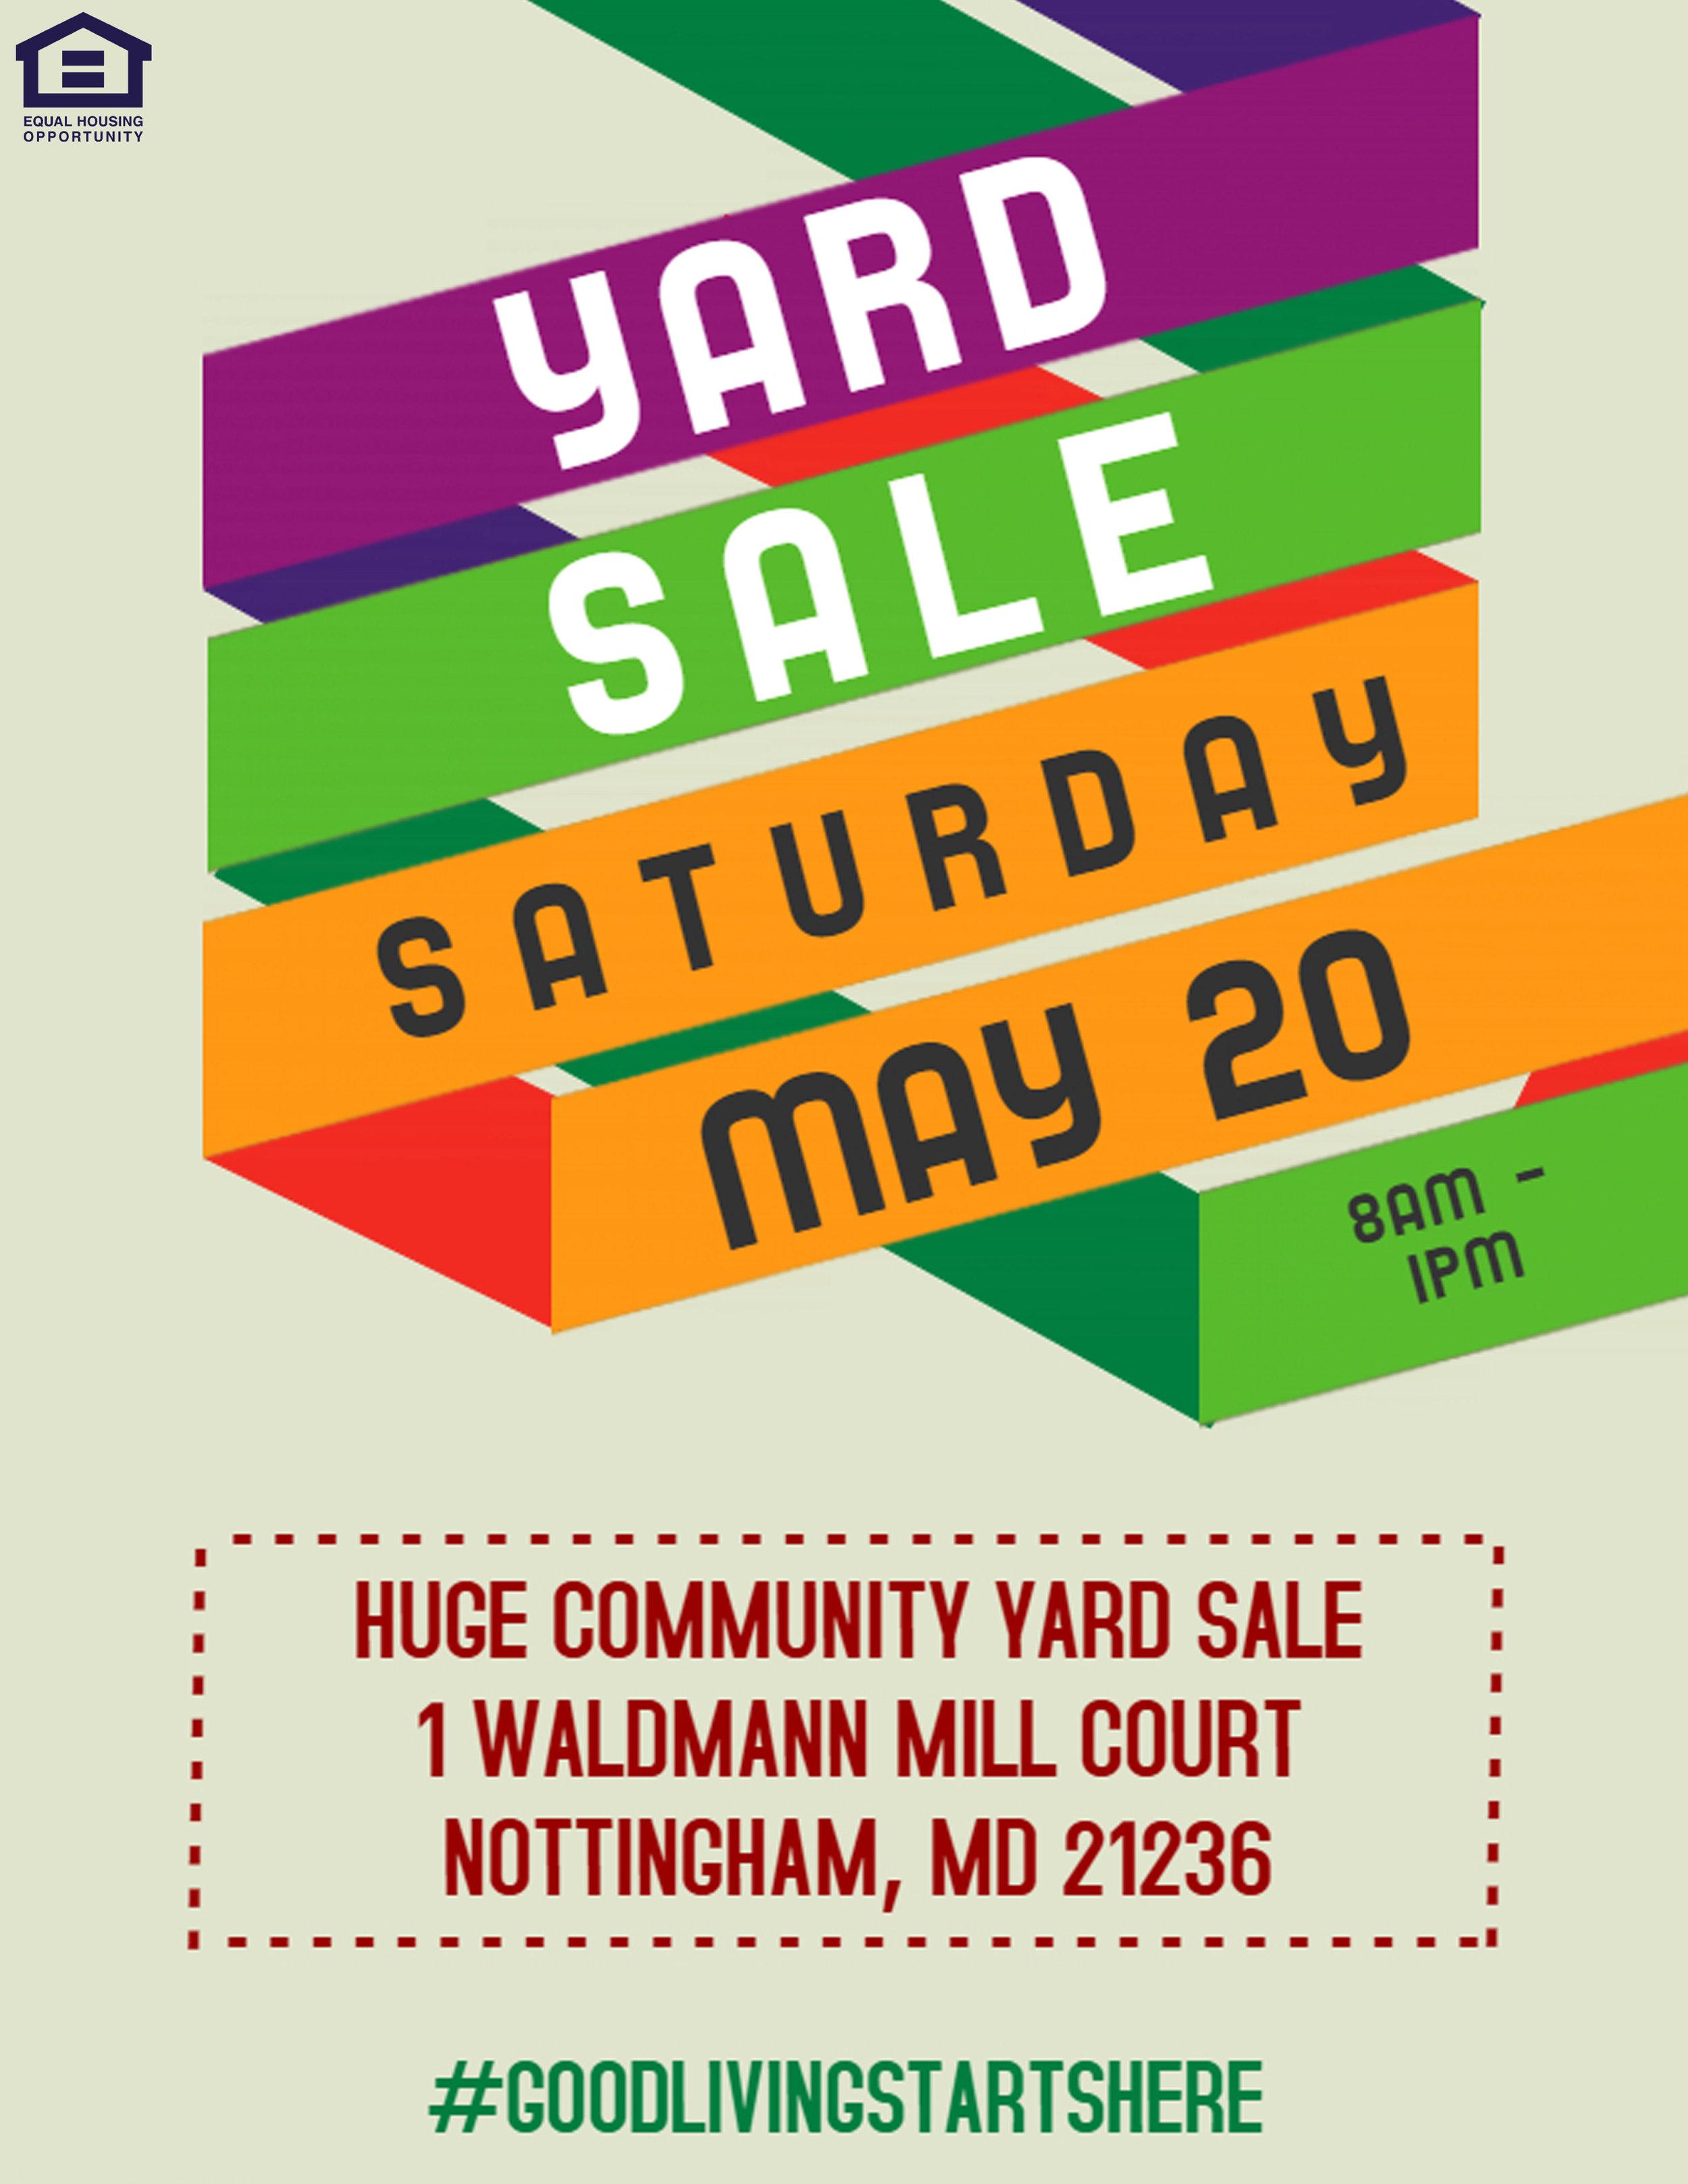 Community Yard Sale in Nottingham, MD